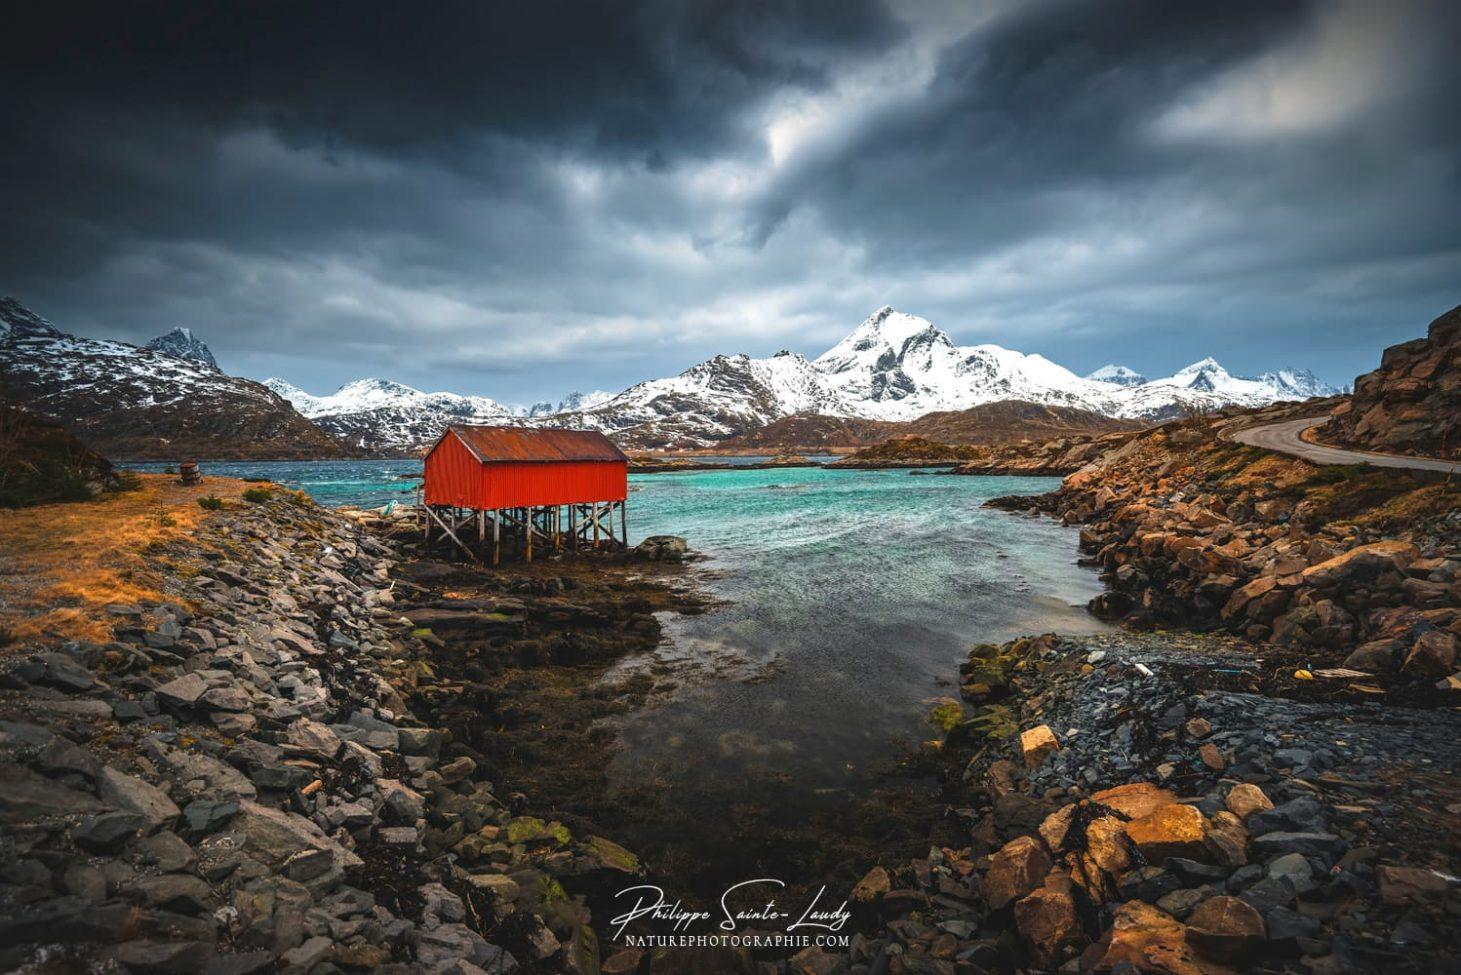 Rorbu sur les îles Lofoten en Norvège